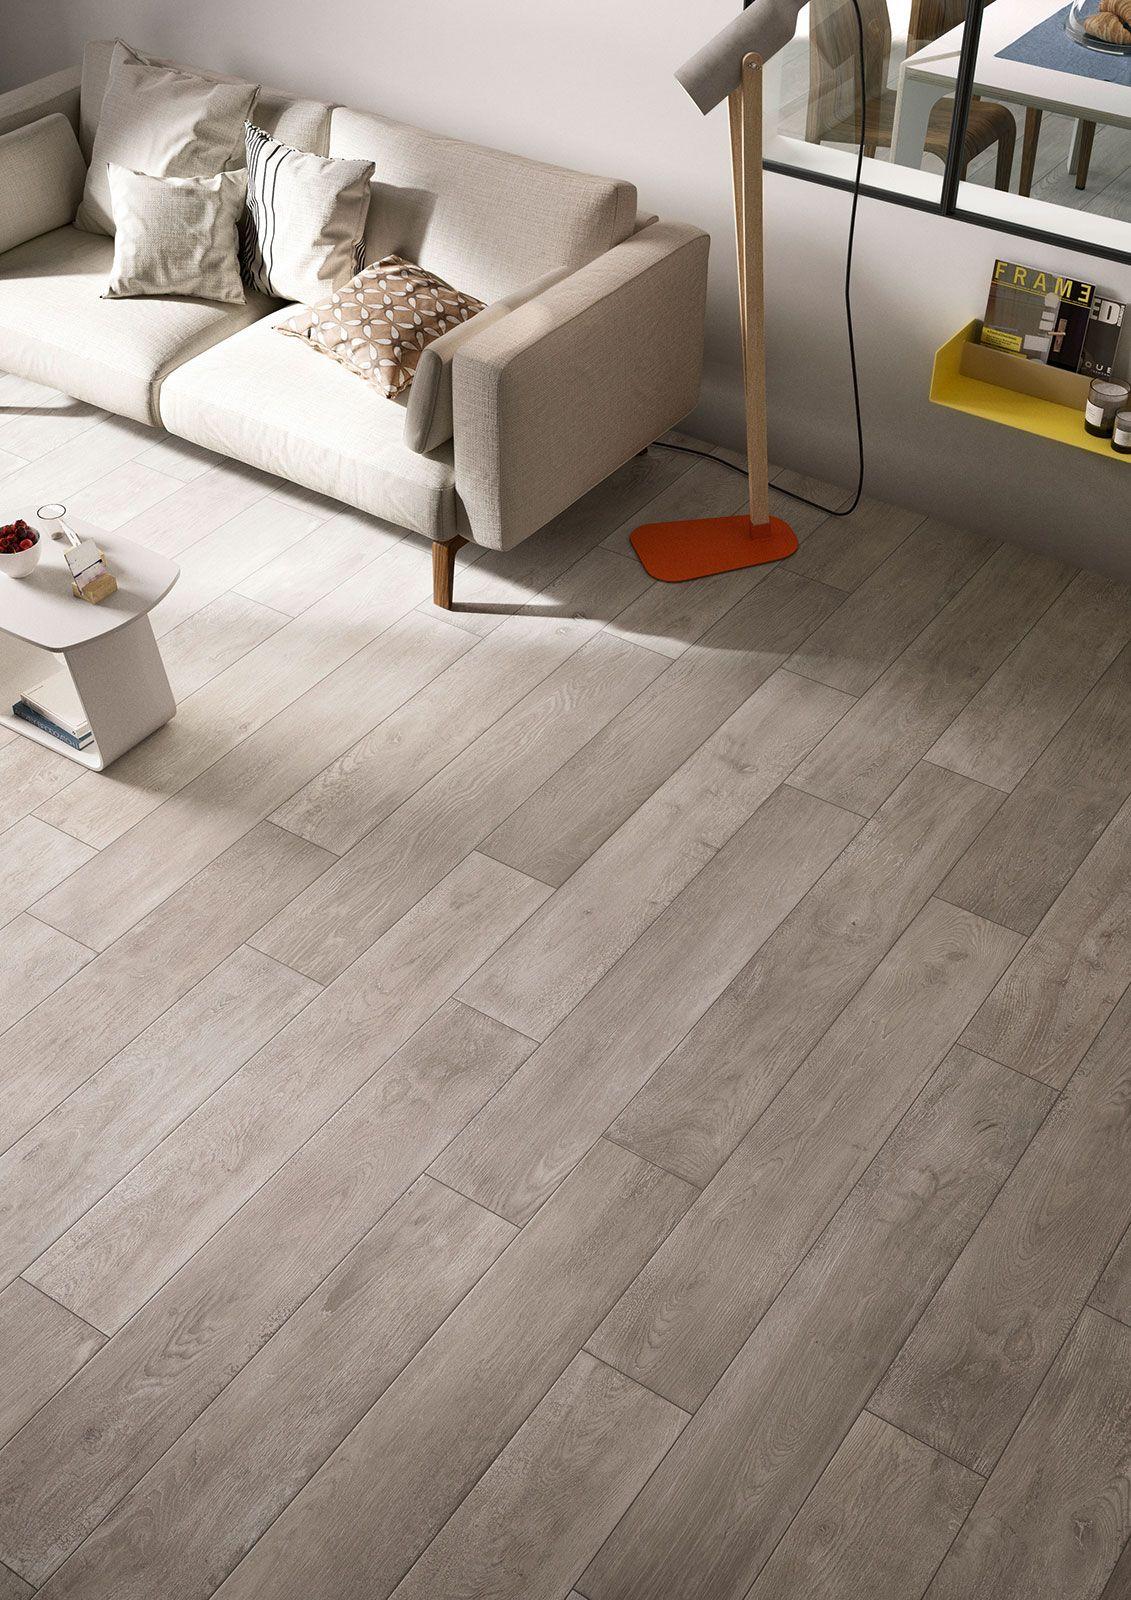 tile wood floor treverktime ceramic tiles marazzi_6535 BXZEAWO